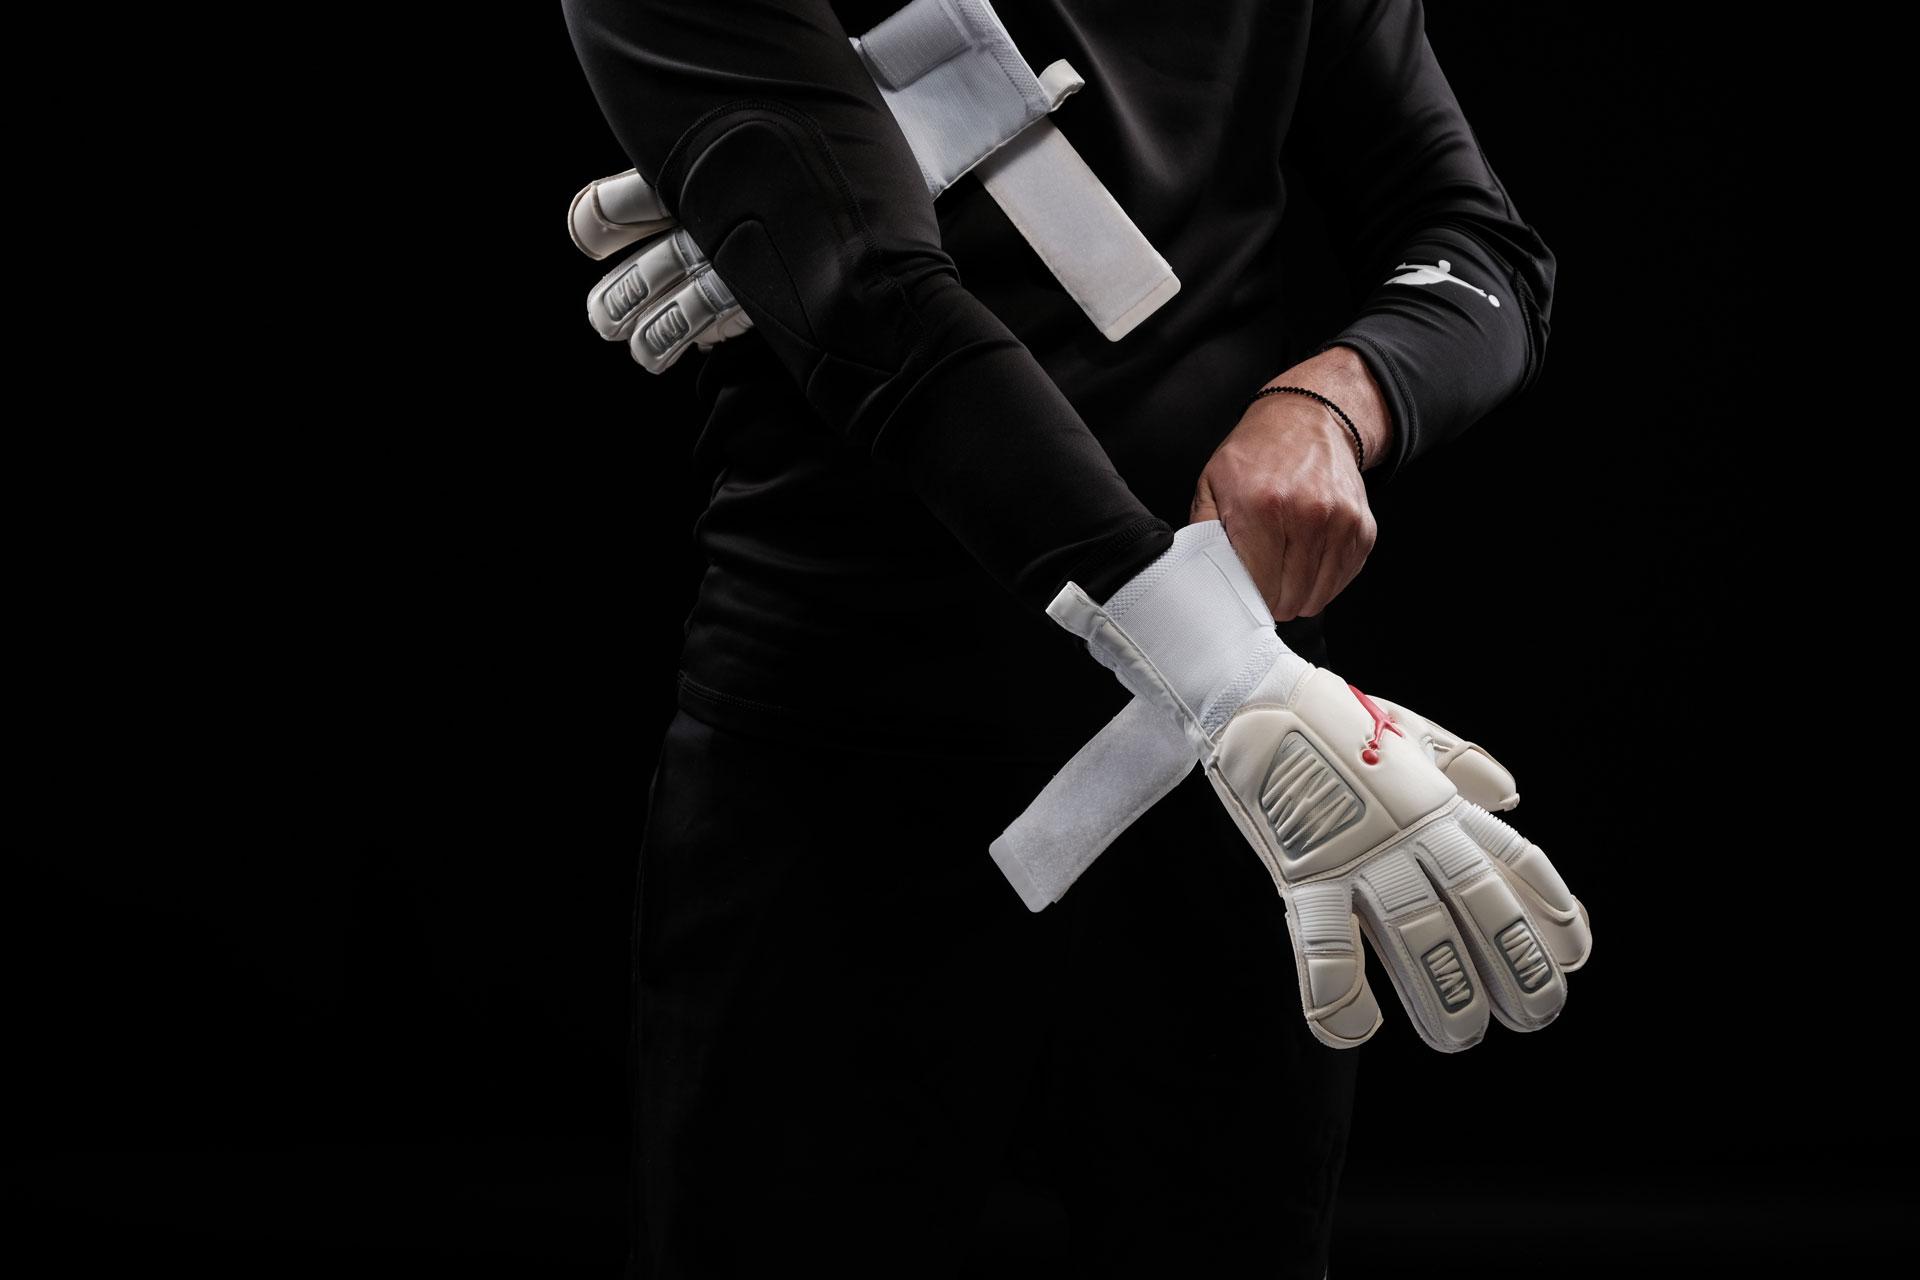 Вратарские перчатки Brave GK Reskuer-официальный интернет-магазин Brave GK